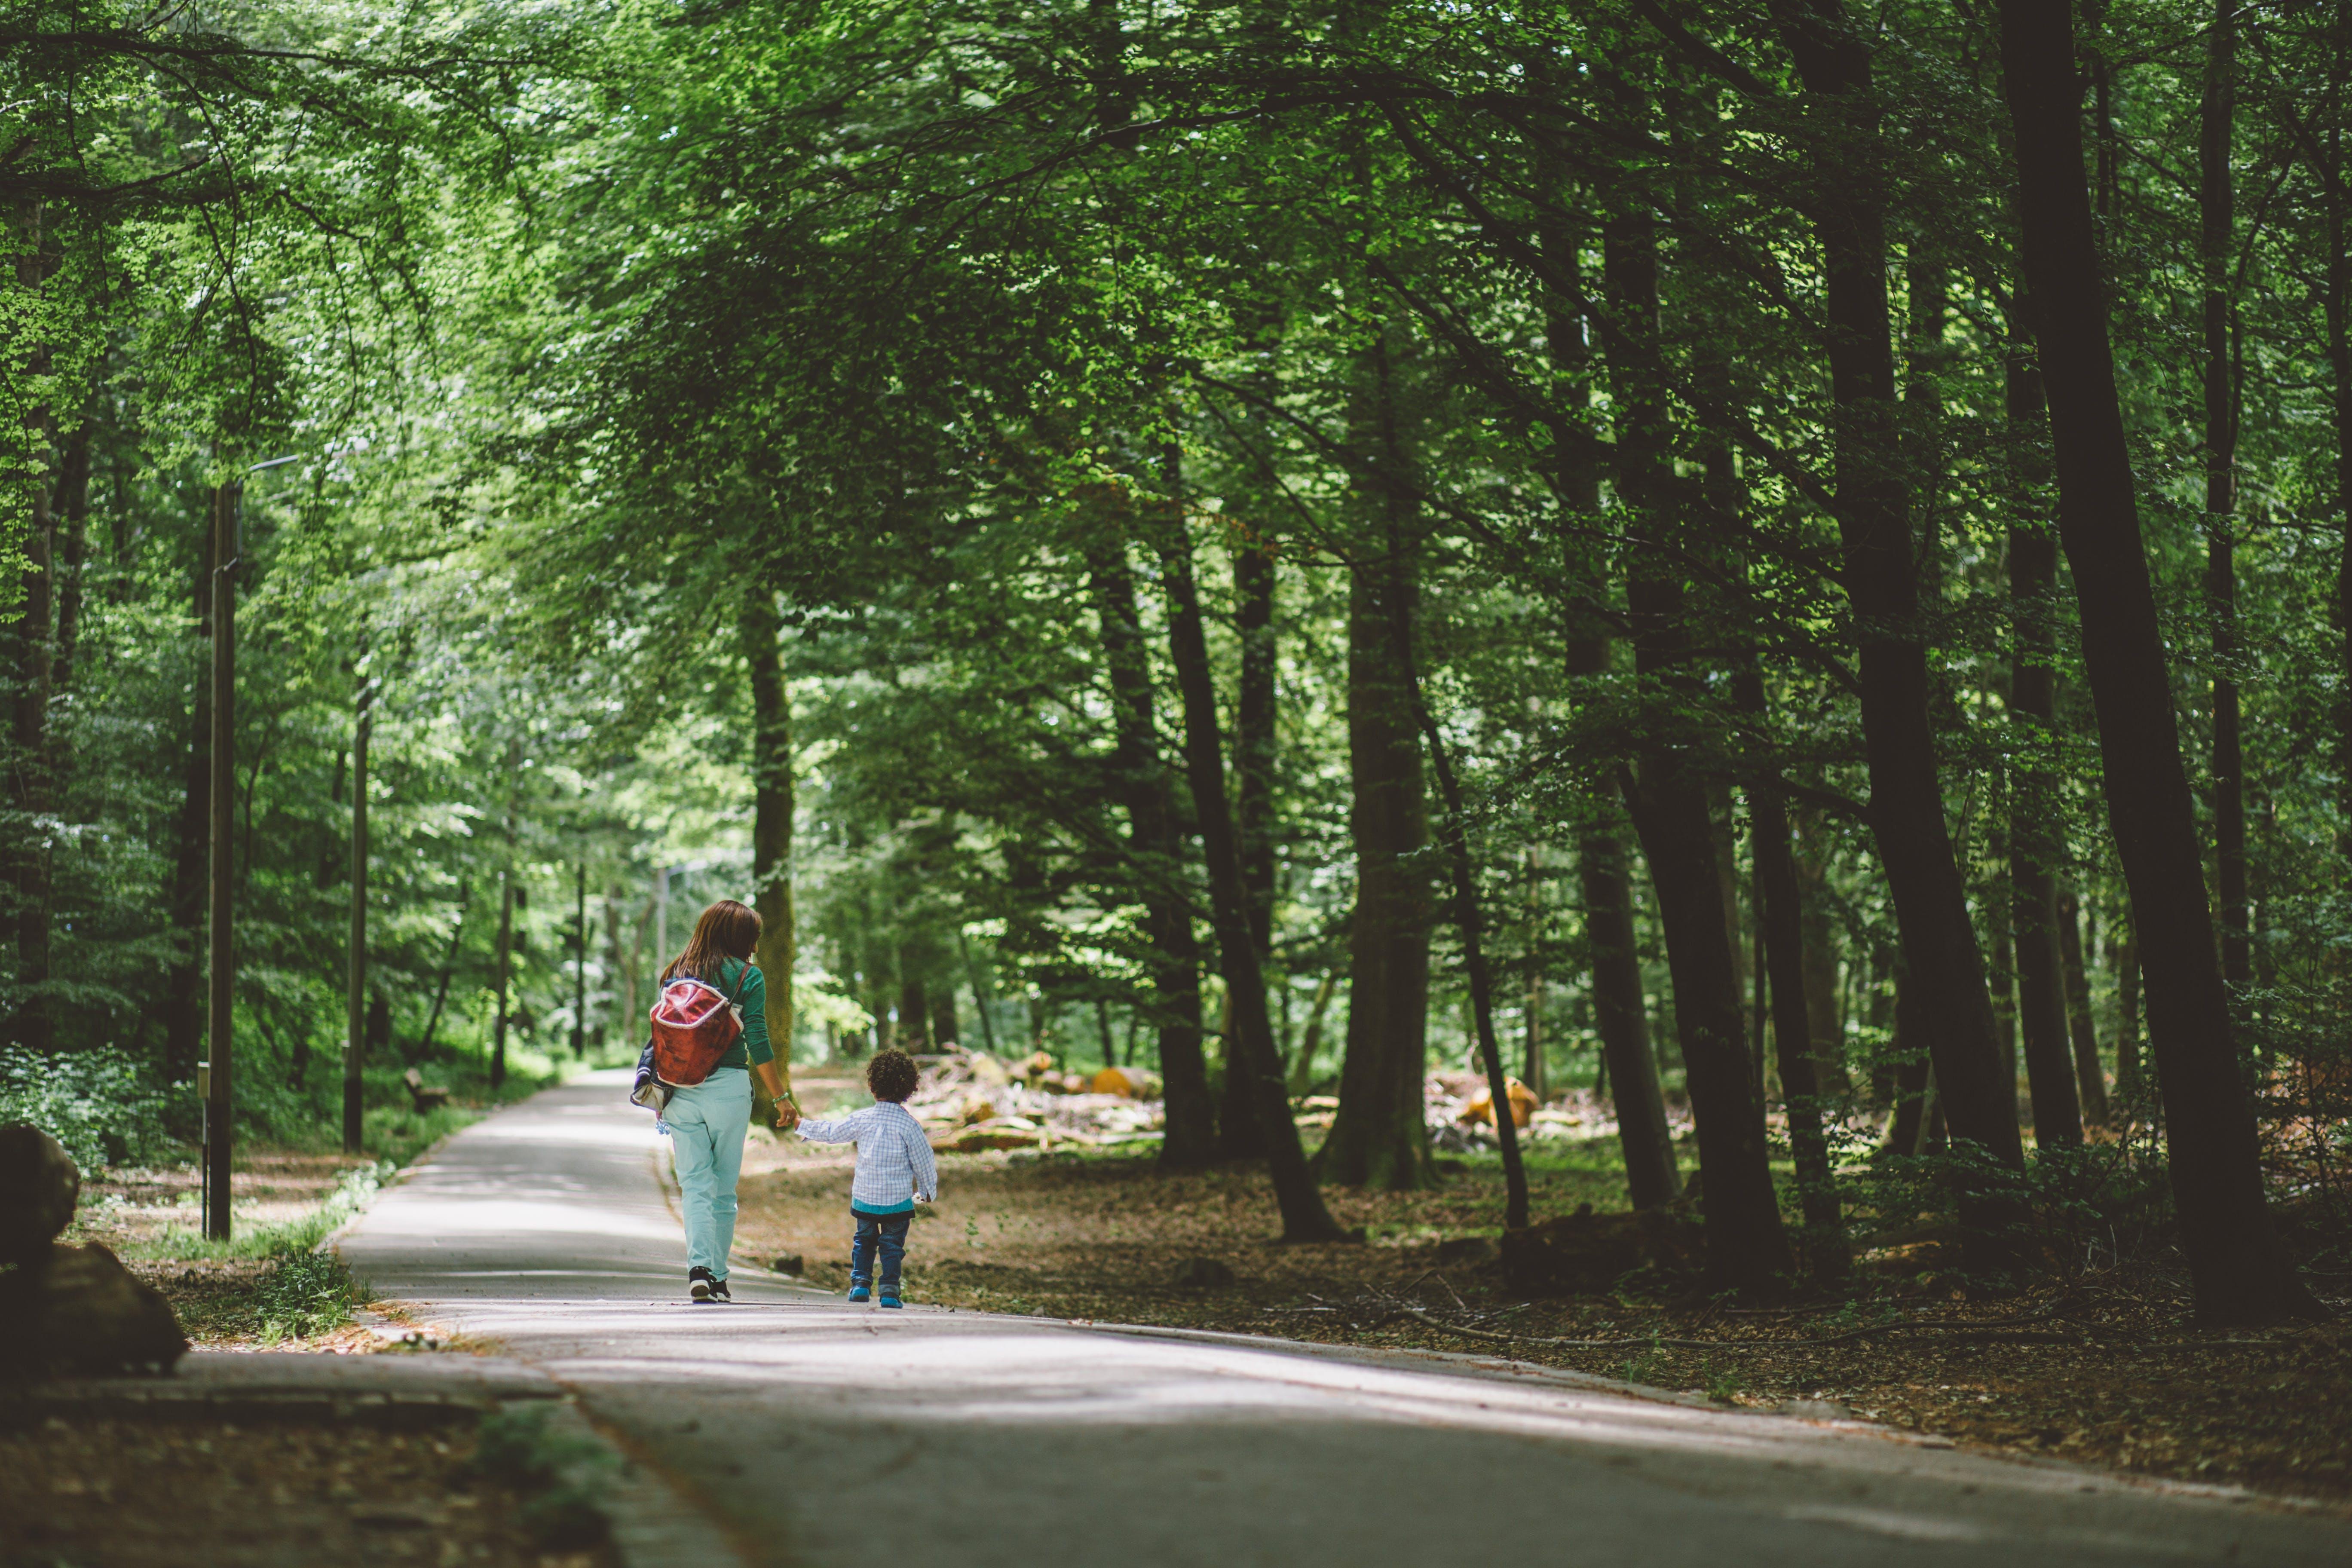 Woman Wearing Green Shirt and Red Bag Holding Children Wearing White Long Sleeve Shirt Walking